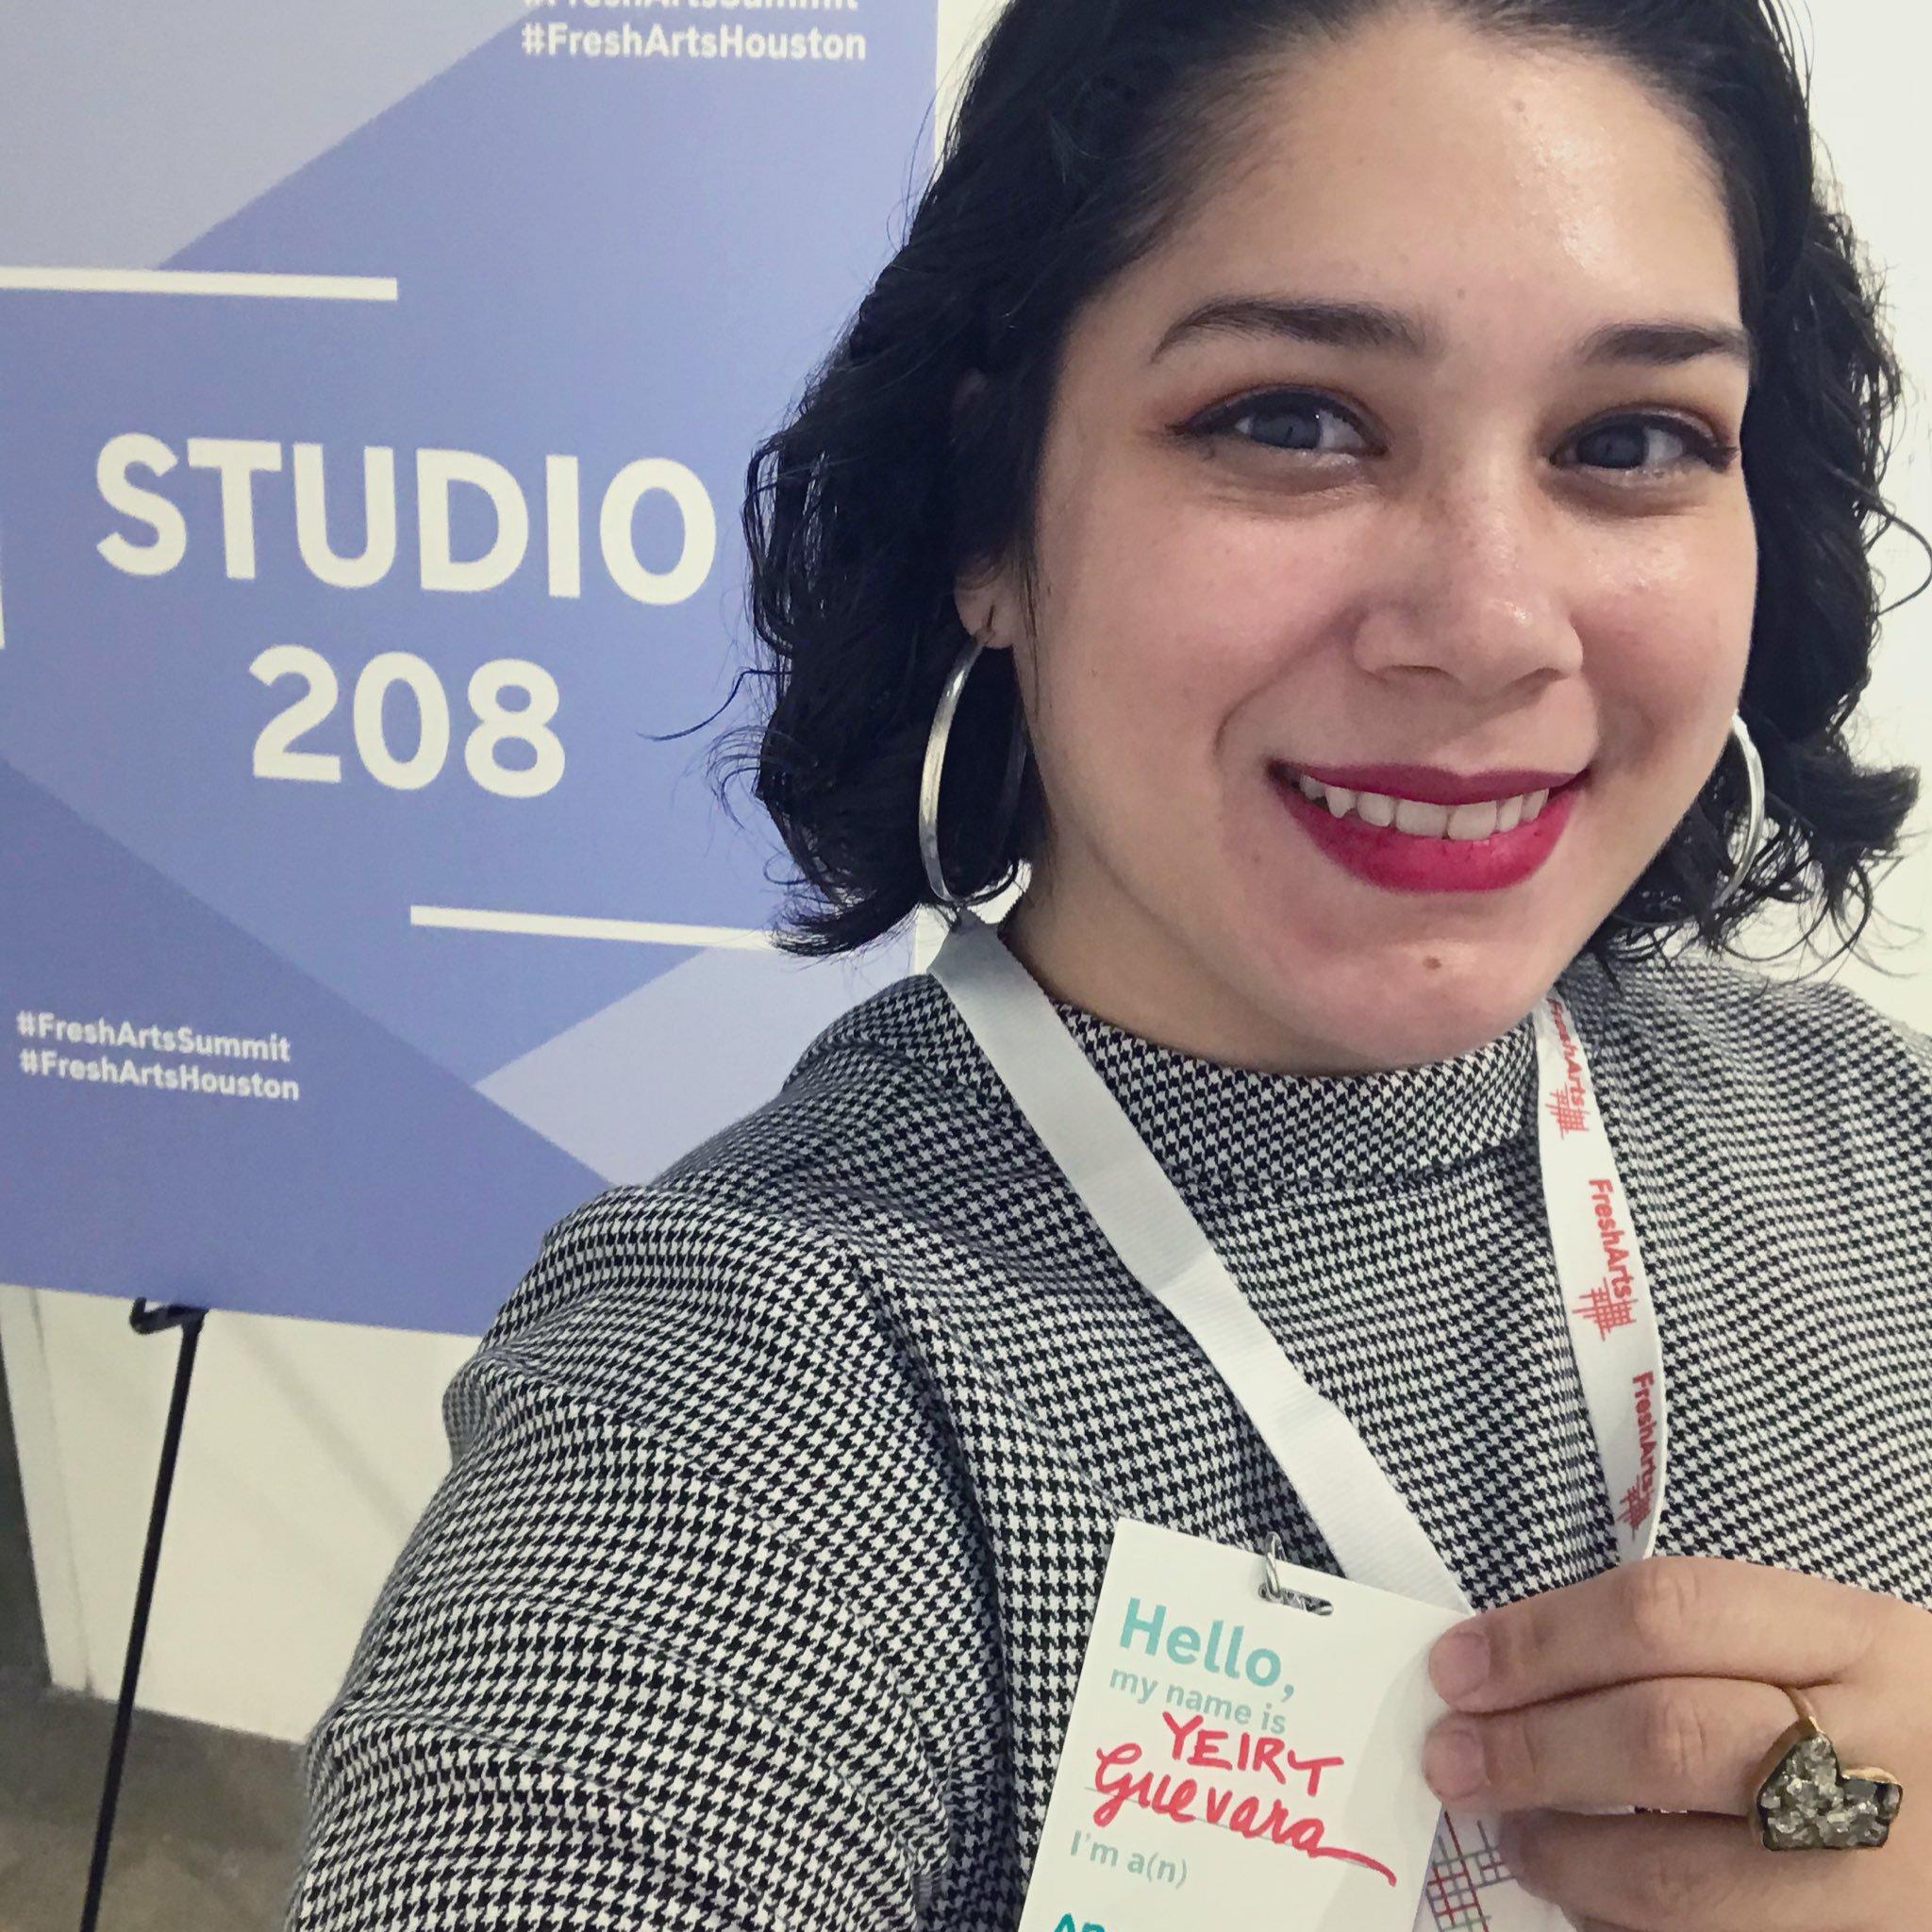 Workshop Presenter for the Fresh Arts Summit